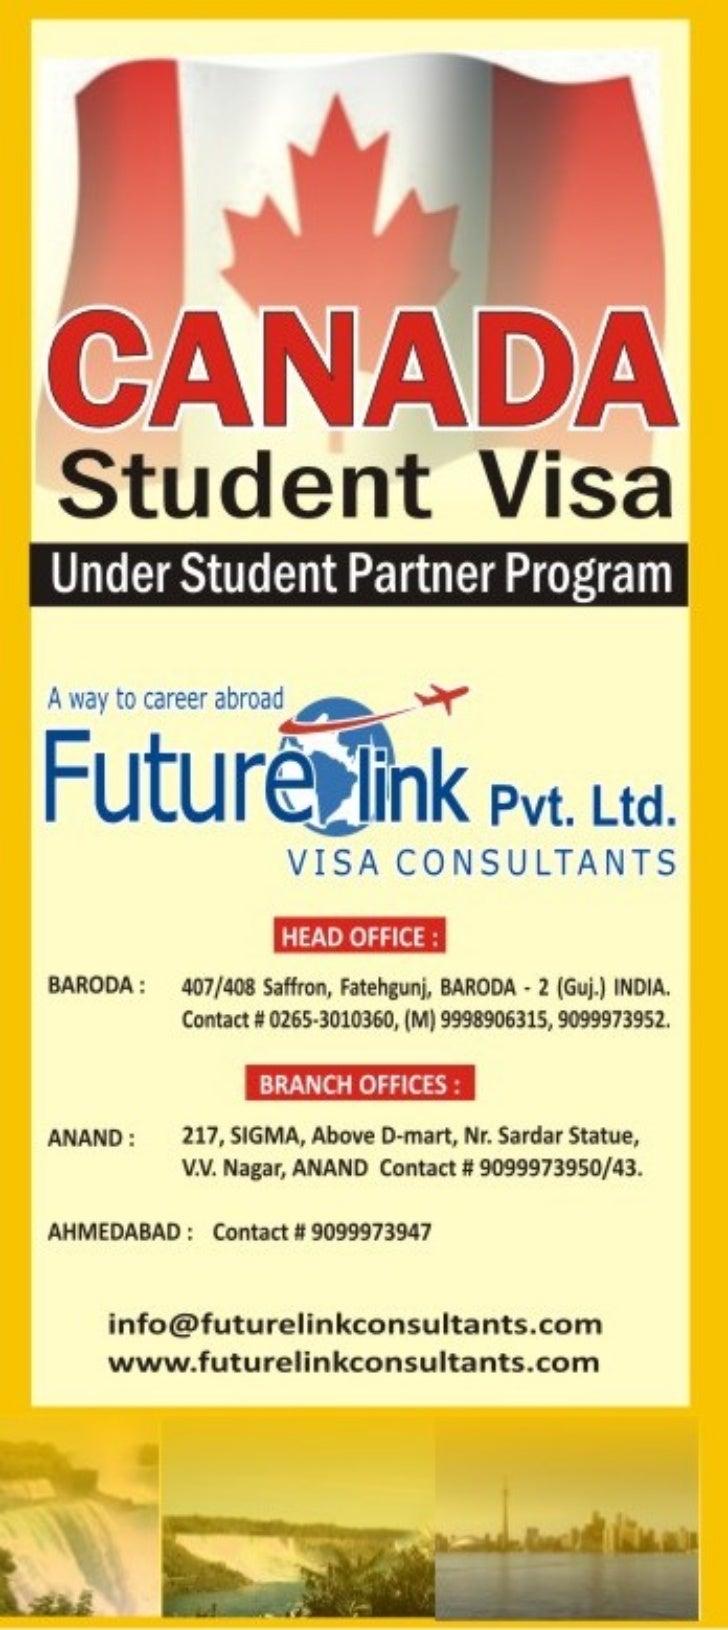 Futurelink Visa Consultants Pvt. Ltd - Student Partners Program -SPP Program Canada, Study in Canda